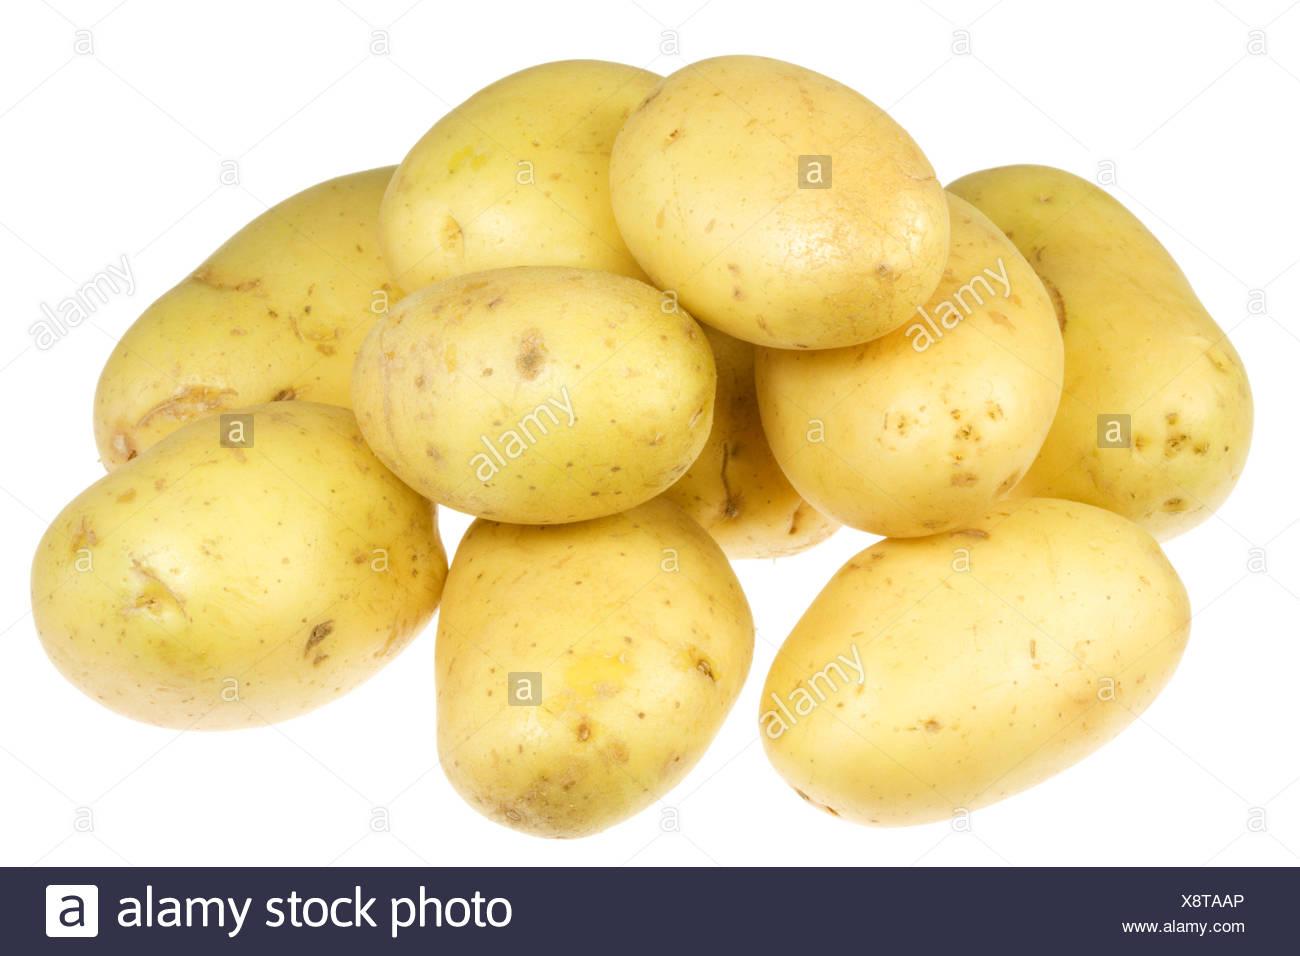 Potatoes on white. - Stock Image